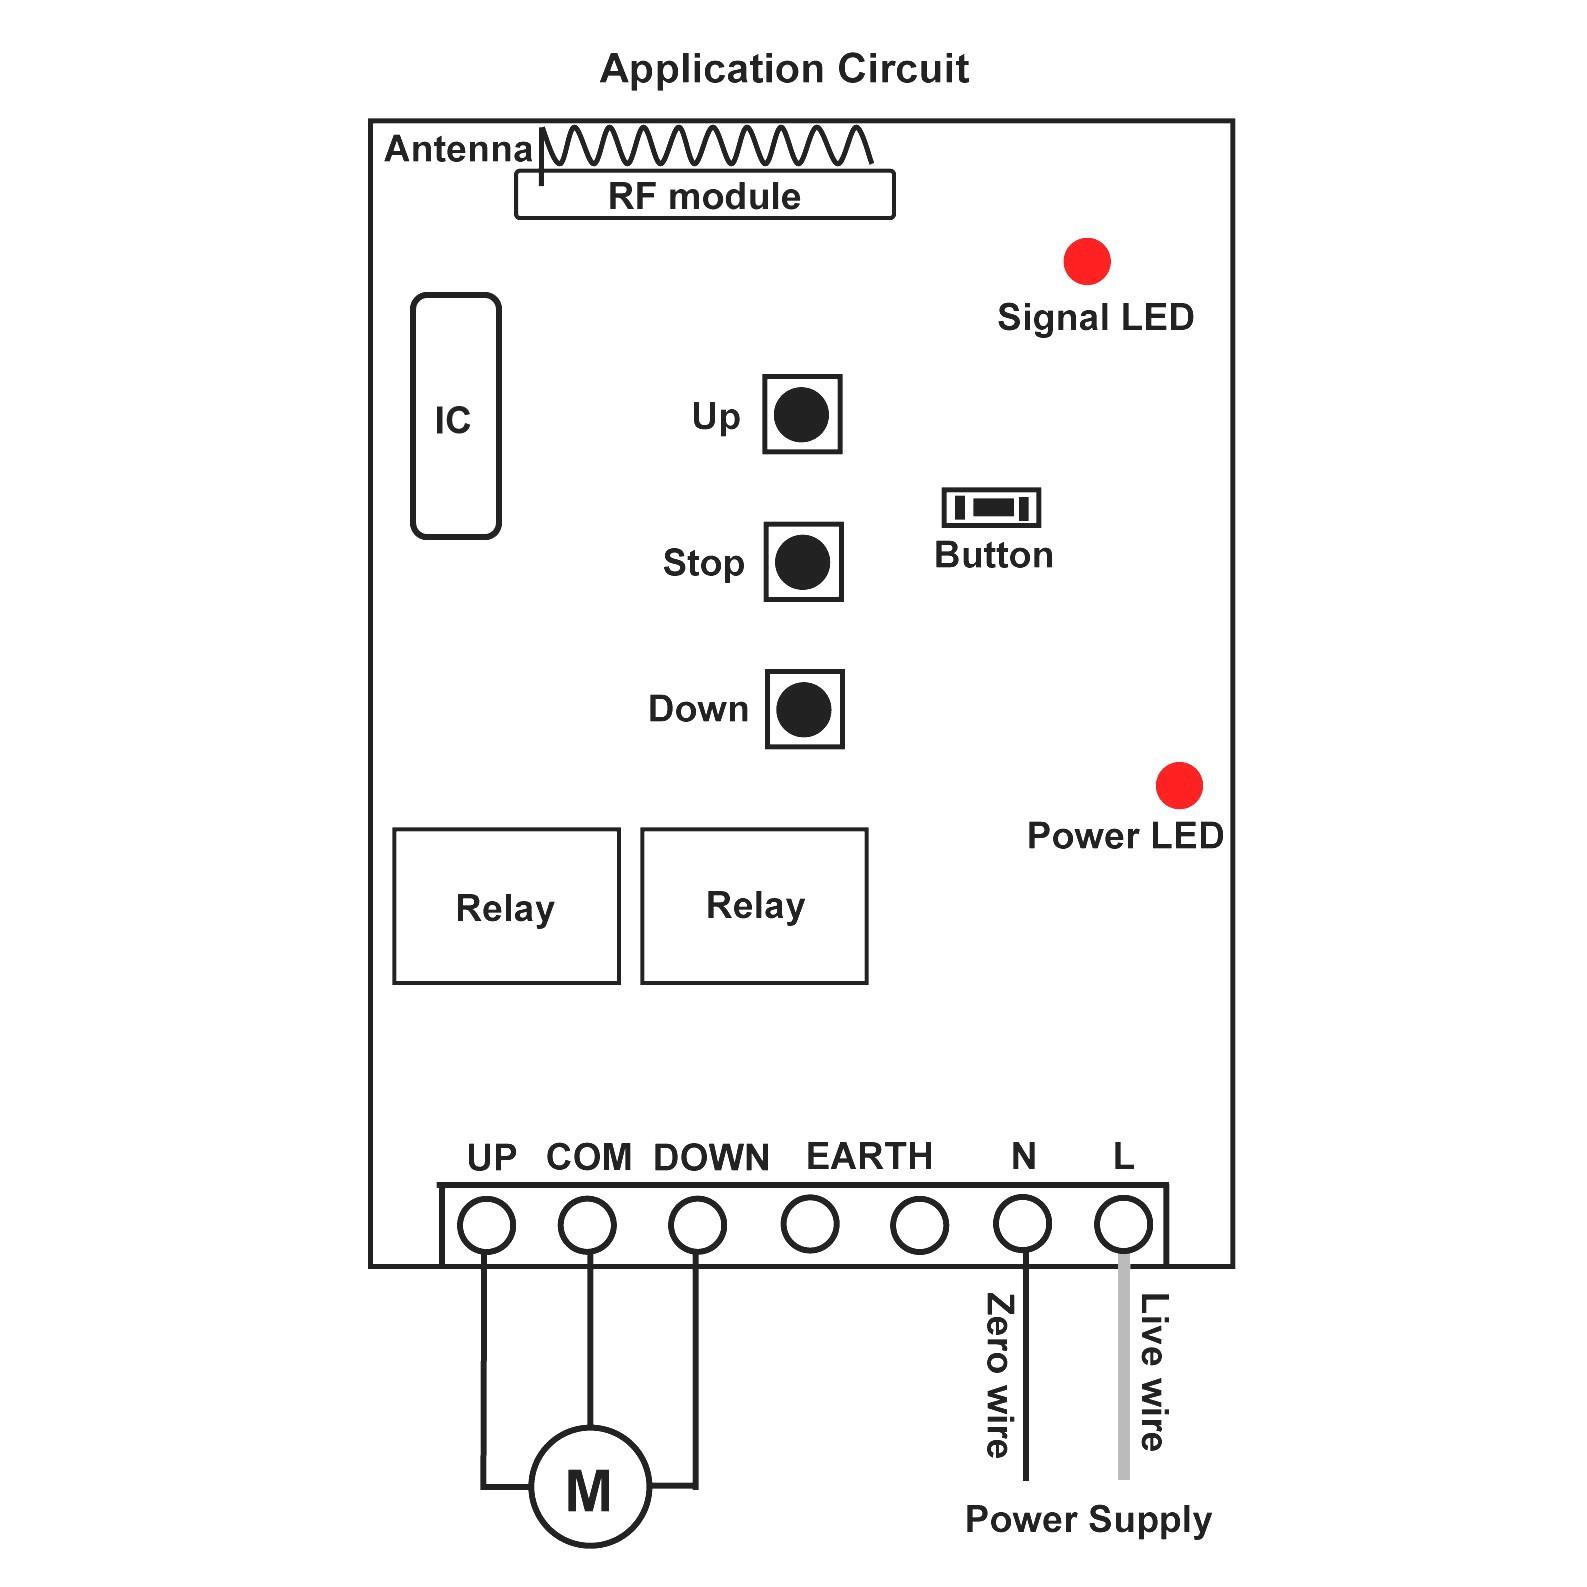 Outstanding 220V Welder Plug Wiring Diagram Gallery Wiring Diagram Sample Wiring Cloud Hisonepsysticxongrecoveryedborg